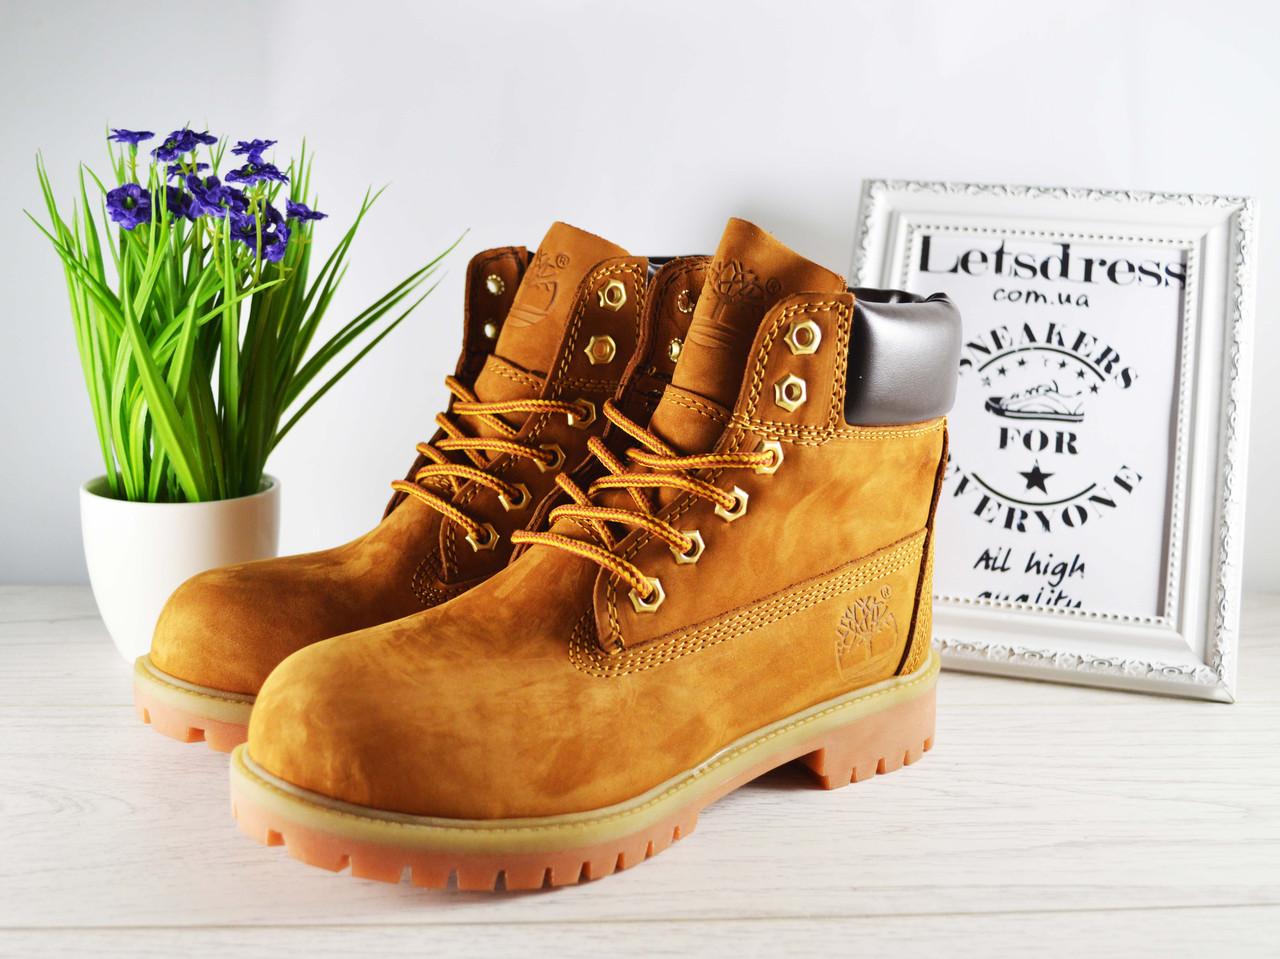 c9b0863a Женские ботинки Timberland кожаные Тимберленд бежевые, коричневые